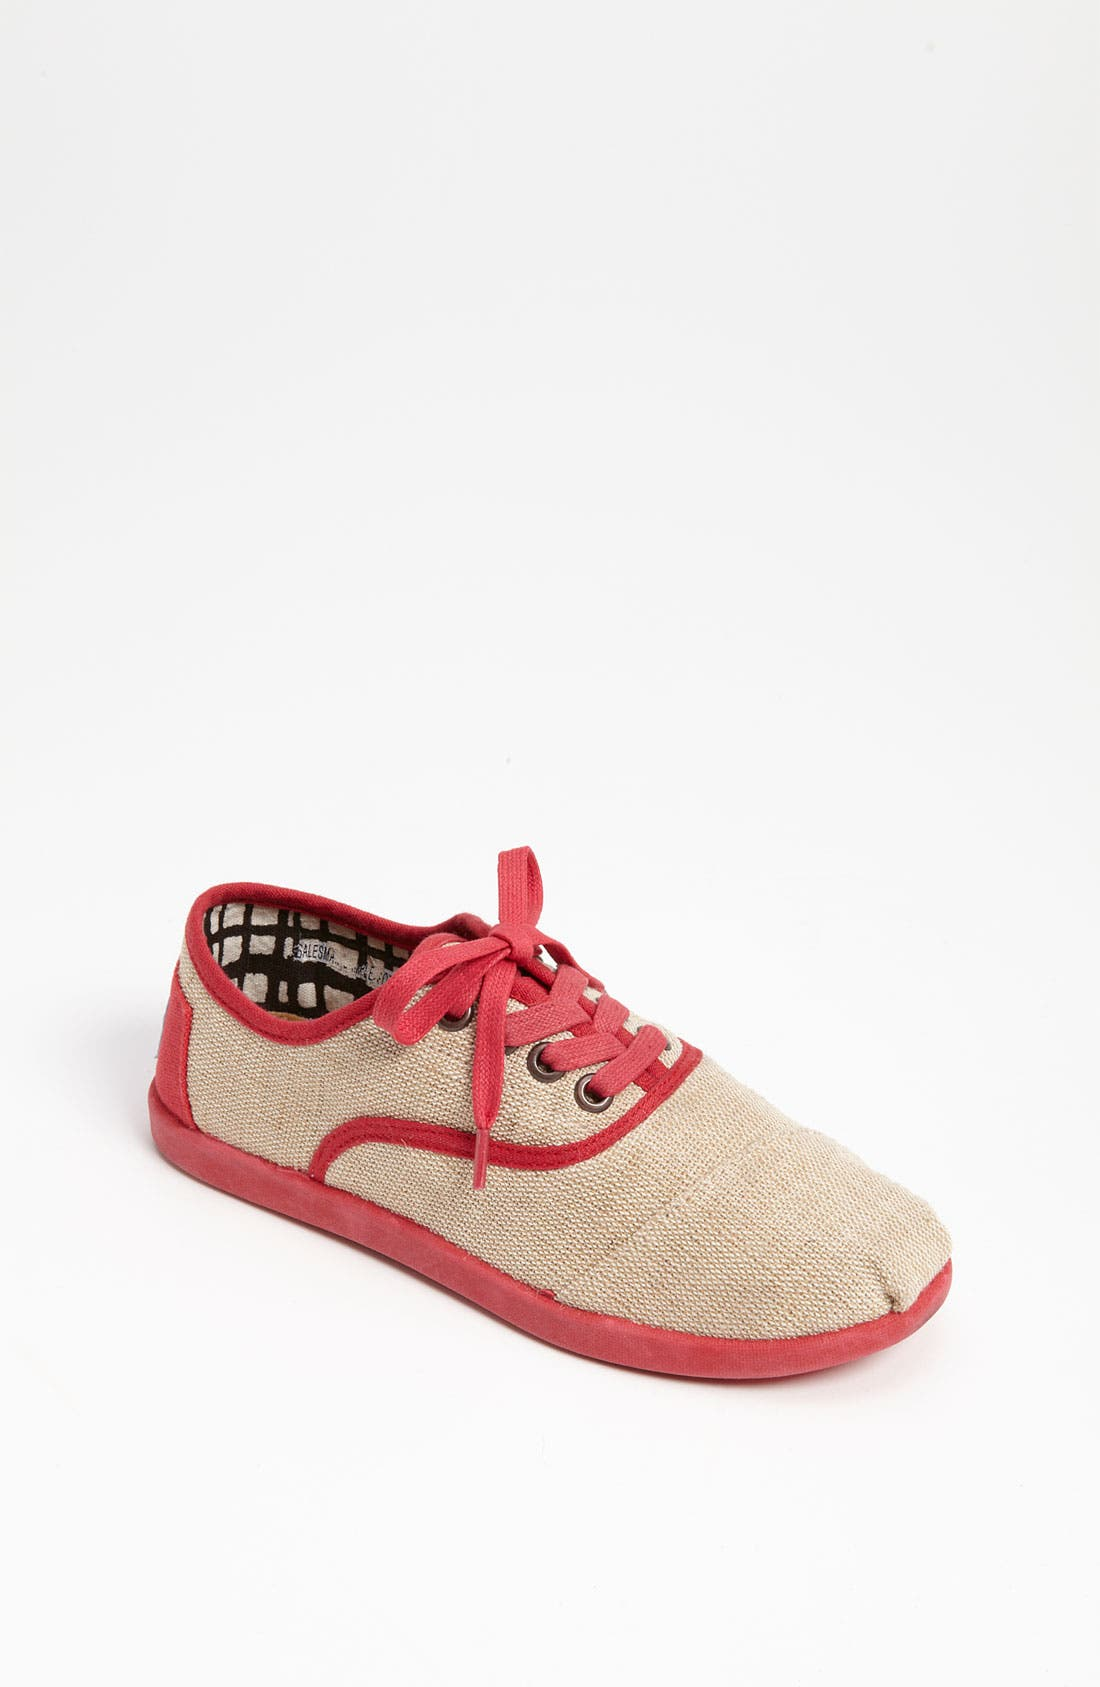 Alternate Image 1 Selected - TOMS 'Cordones Youth - Maddox' Burlap Sneaker (Toddler, Little Kid & Big Kid)